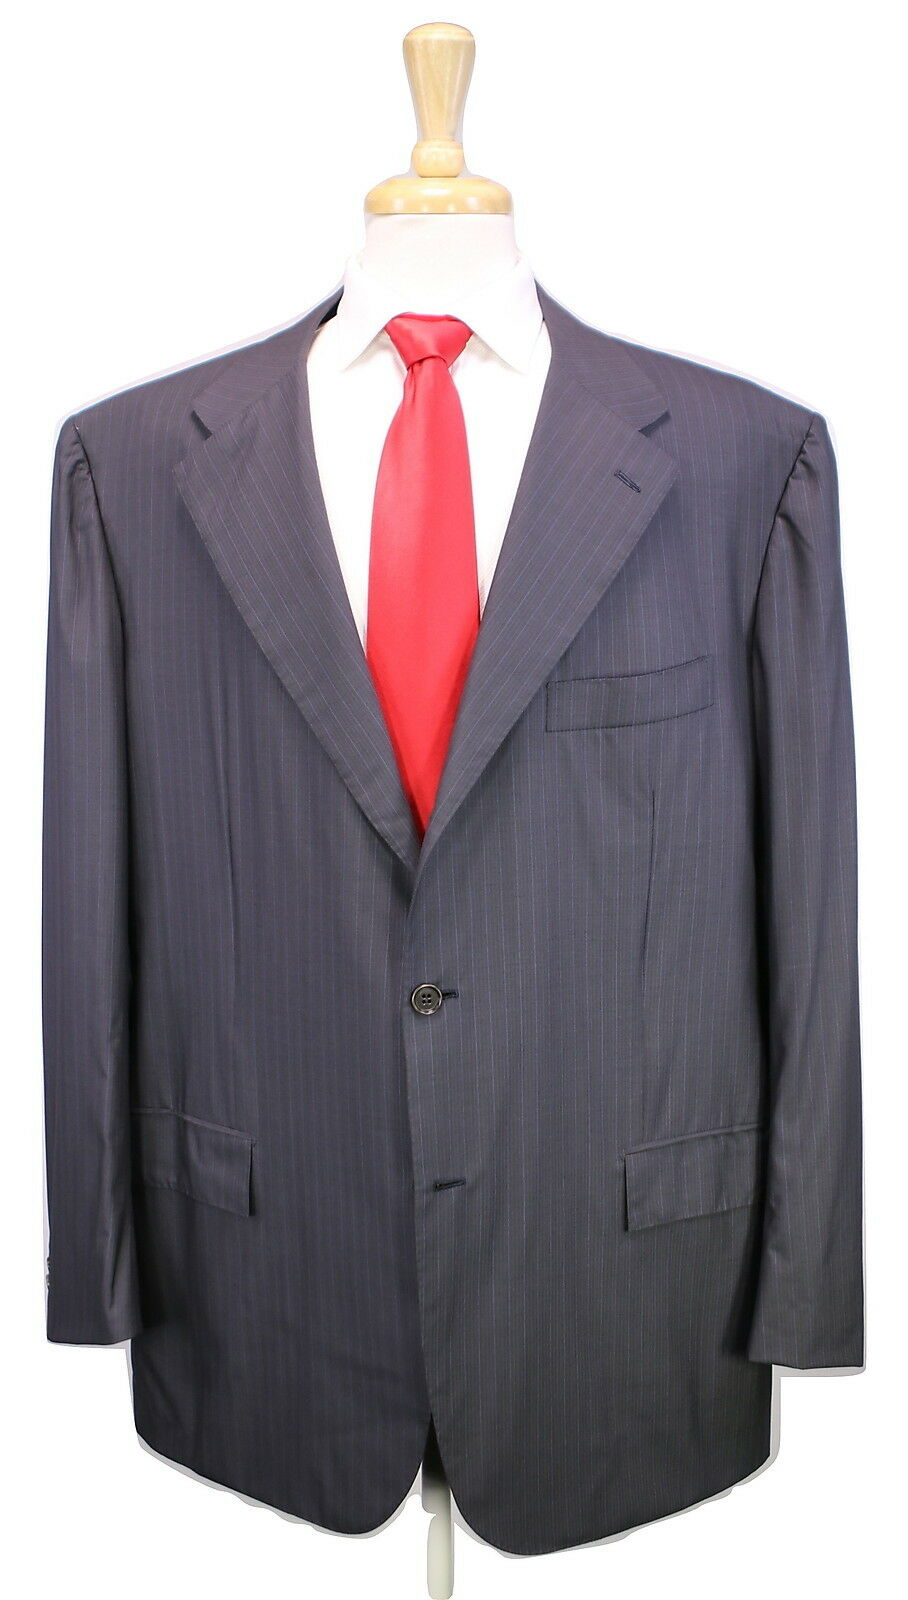 Nwt Neu Kiton 2017 Dunkelgrau Grau Streifen Super 54.9ms Wool 2-btn Suit 52r